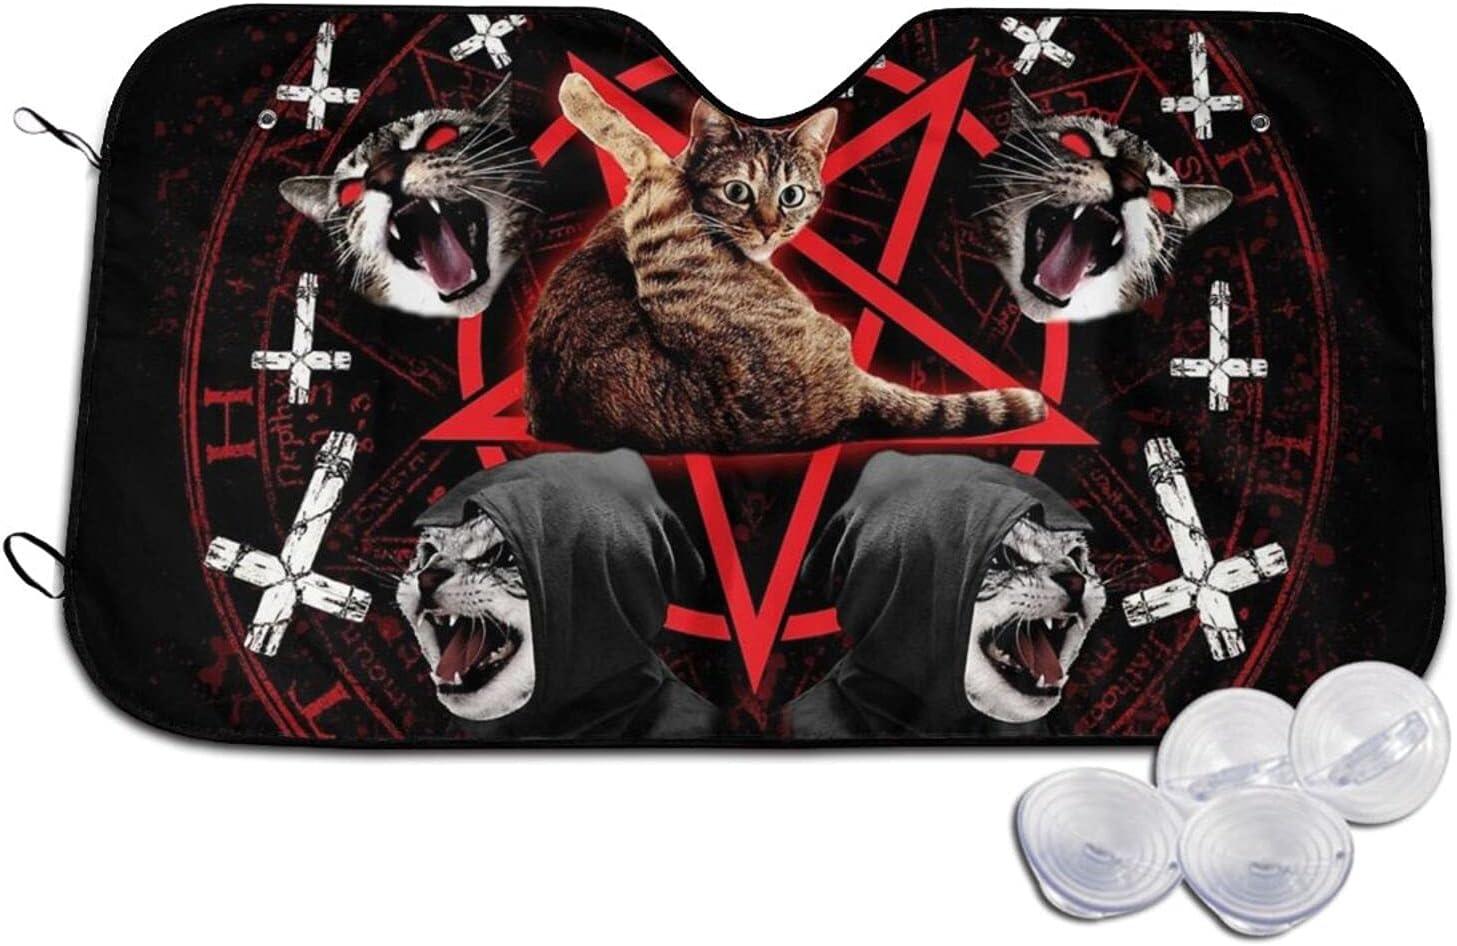 Outdoor Protection Same day shipping UV Rays Blocker Pentagram Satanic Cat Max 73% OFF Death